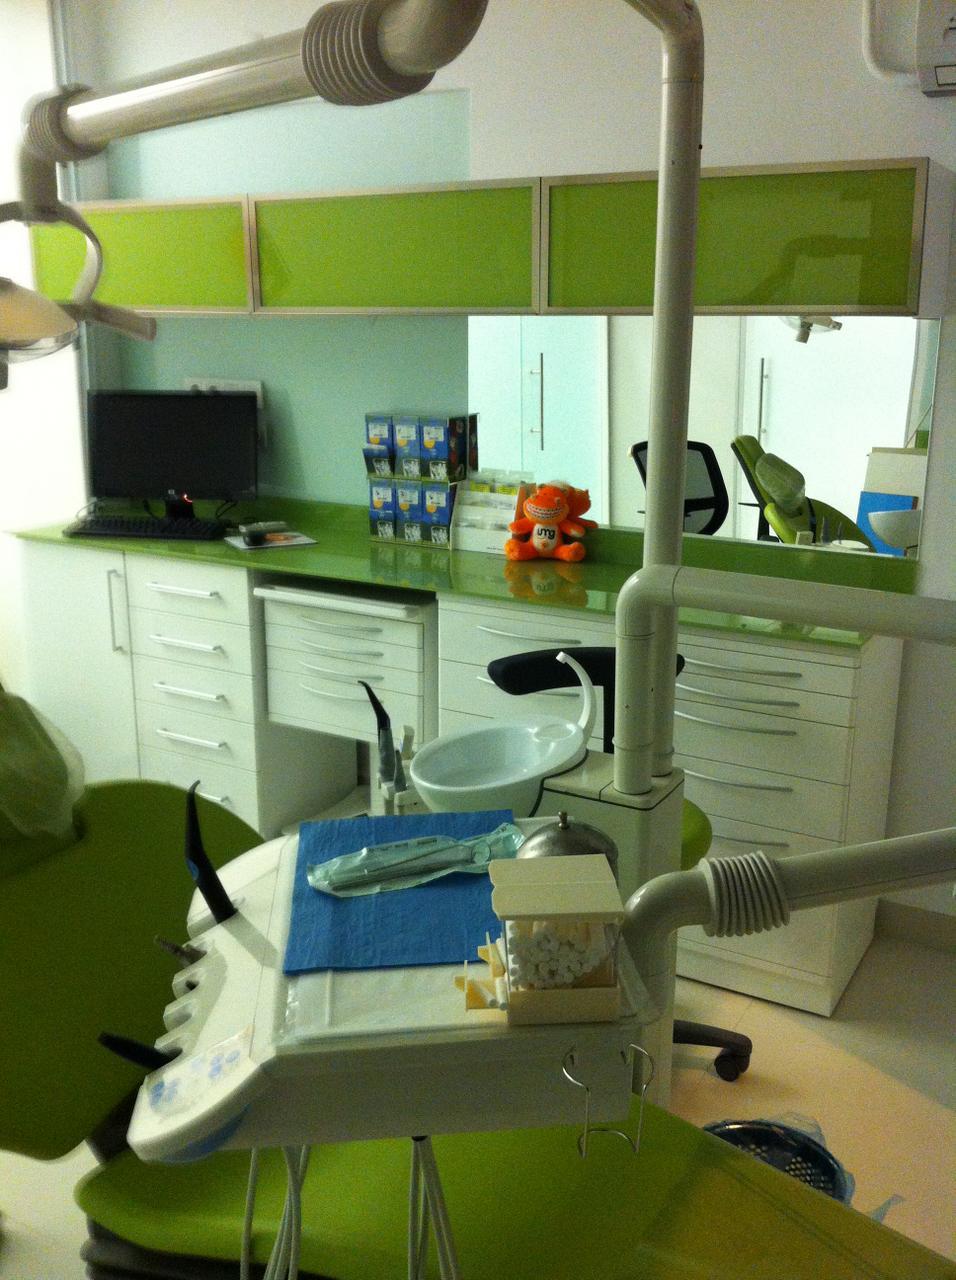 BilgeIldiri_DentalClinic-6.JPG